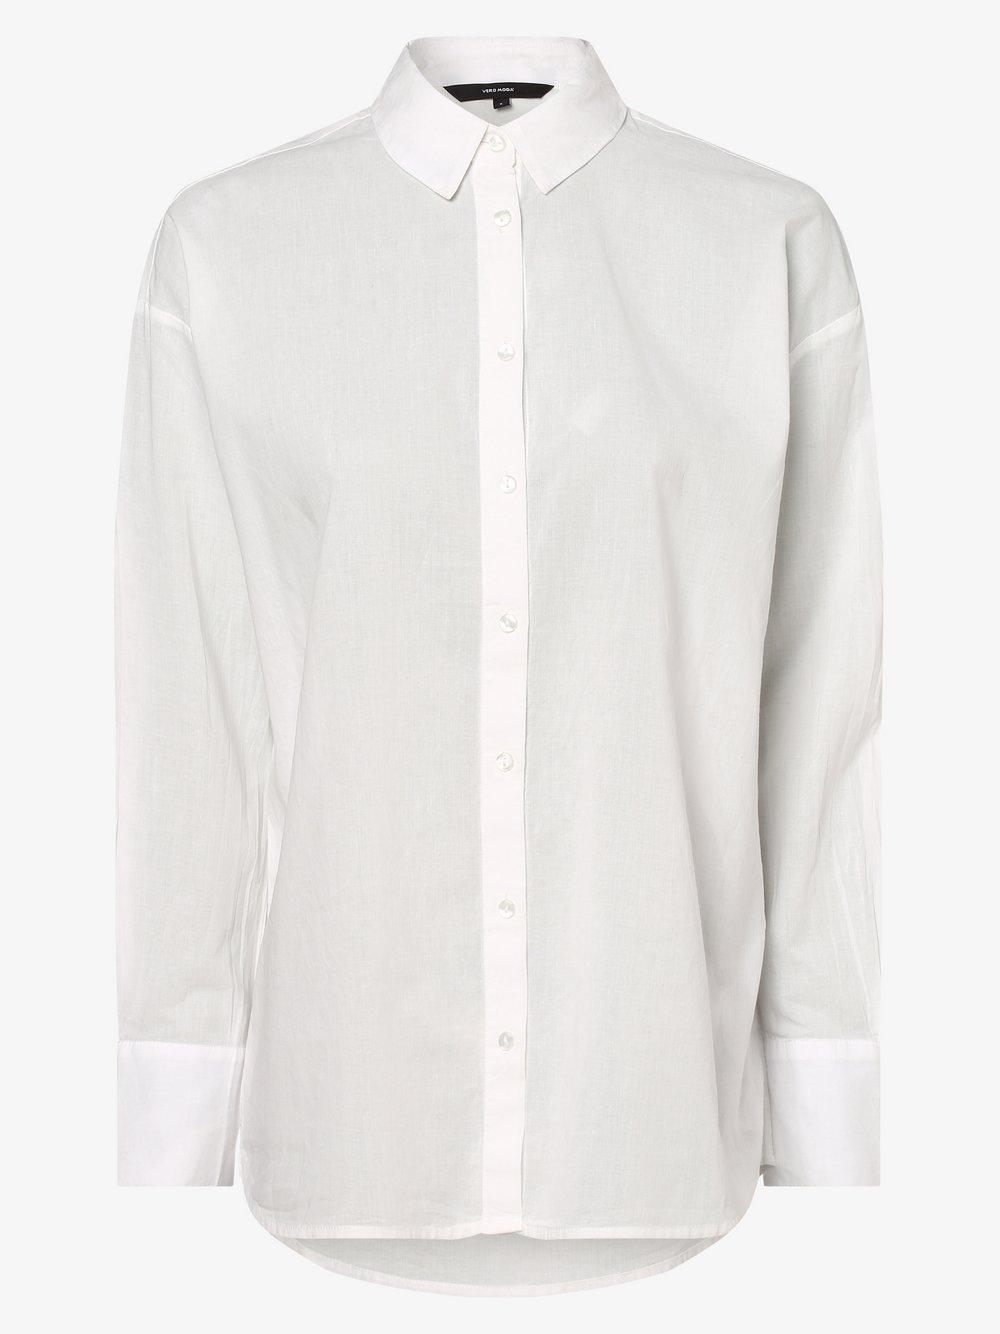 Vero Moda – Bluzka damska – Vmindia, biały Van Graaf 466376-0001